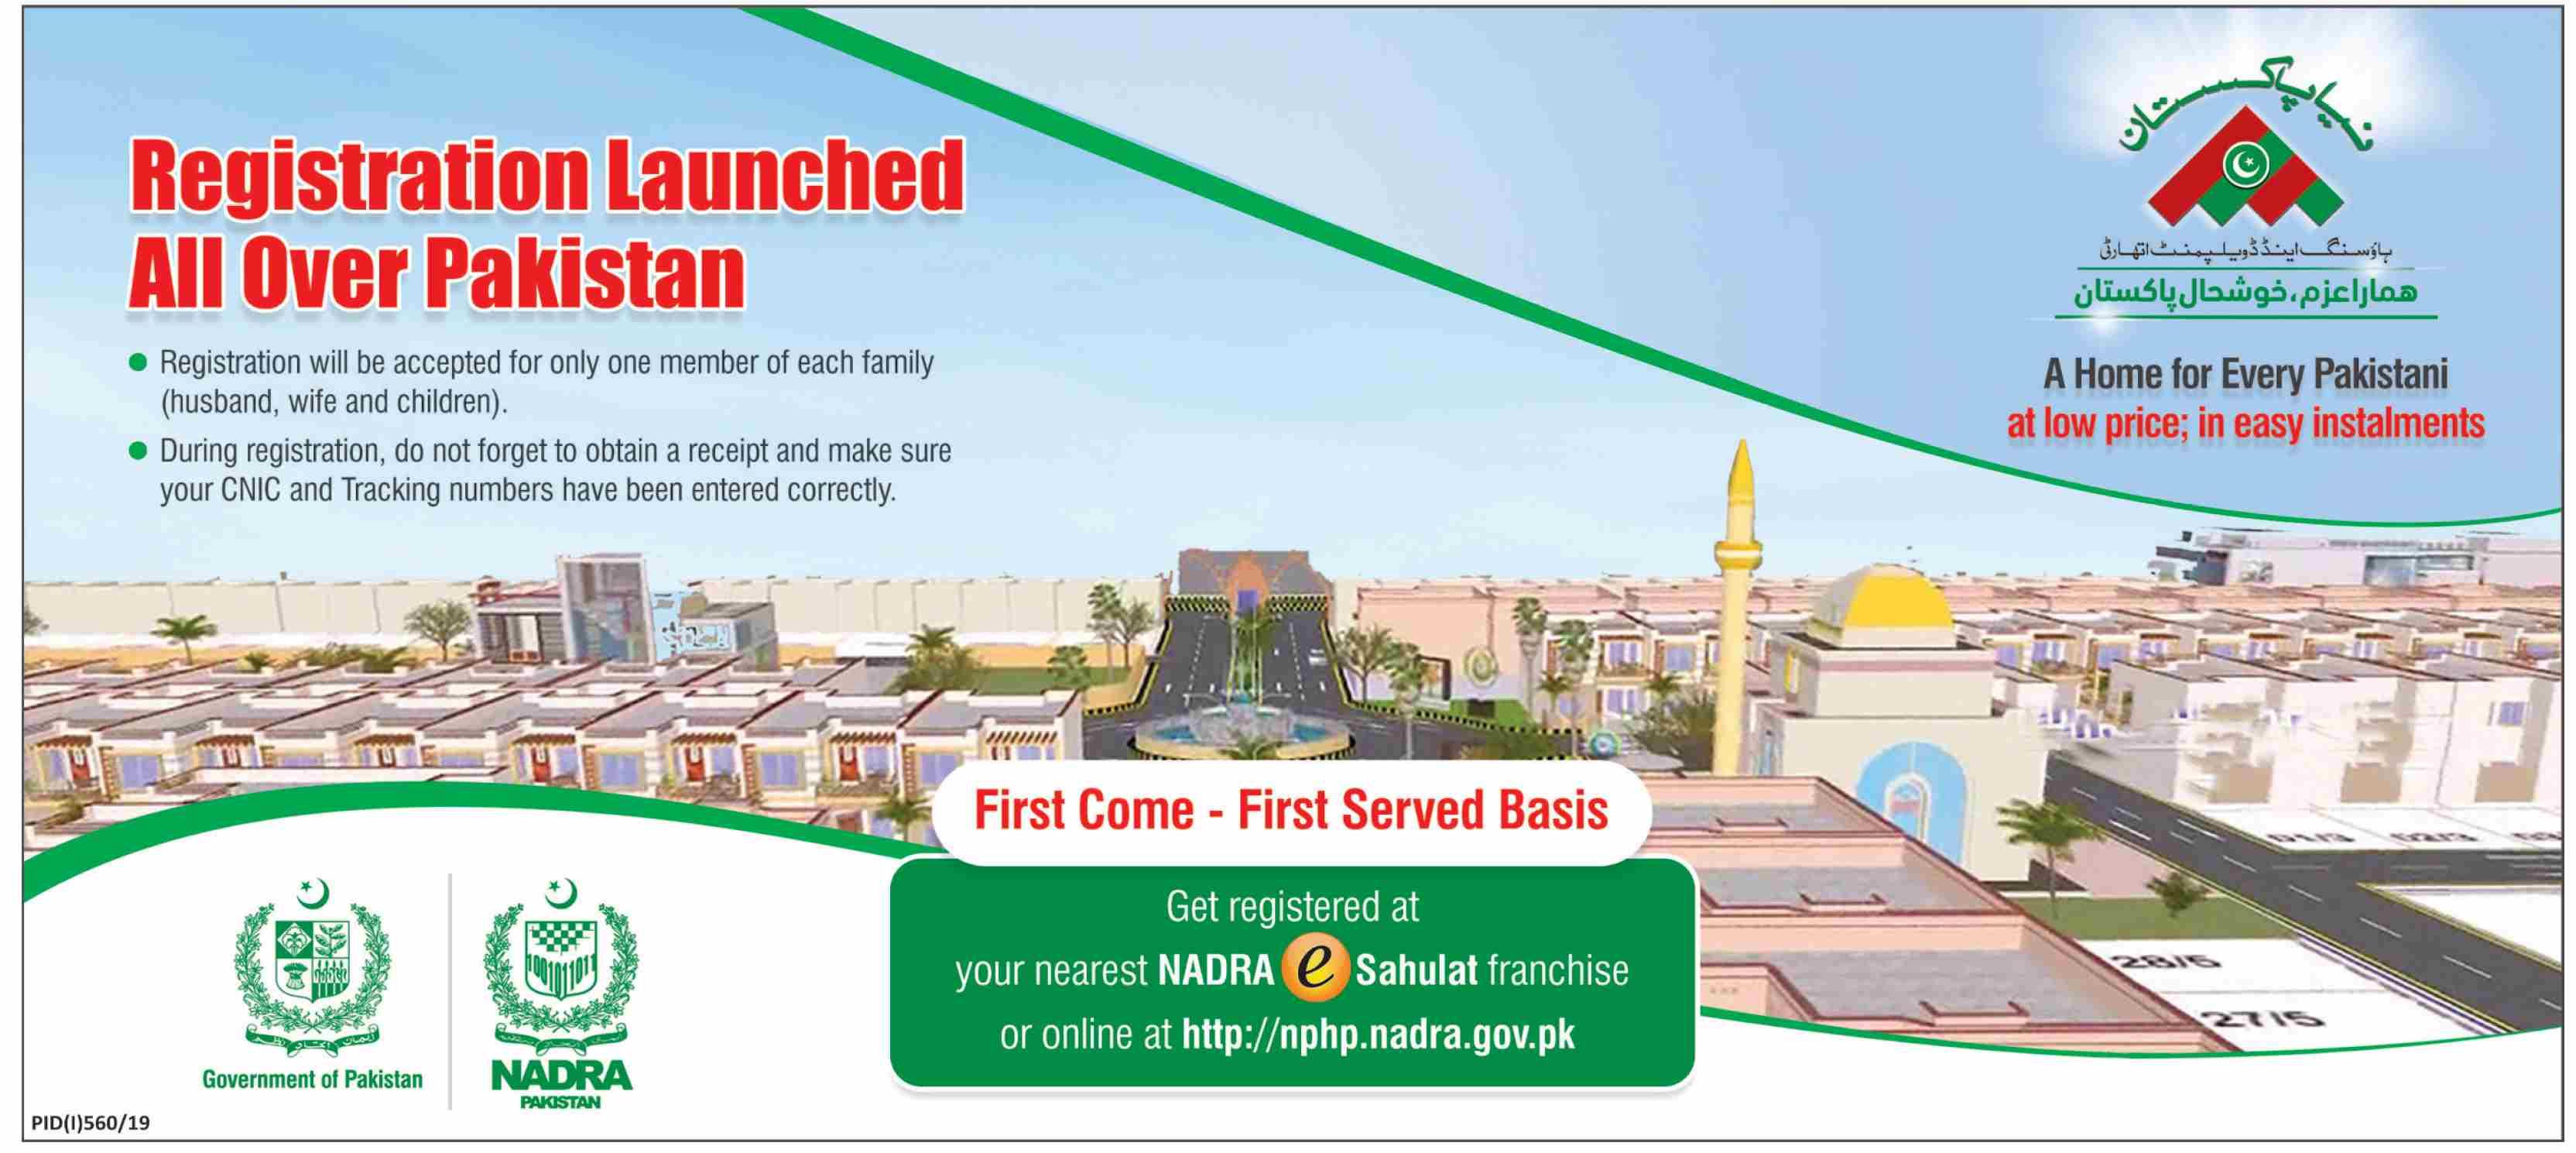 Registration Open for All Over Pakistan for Naya Pakistan Housing Program